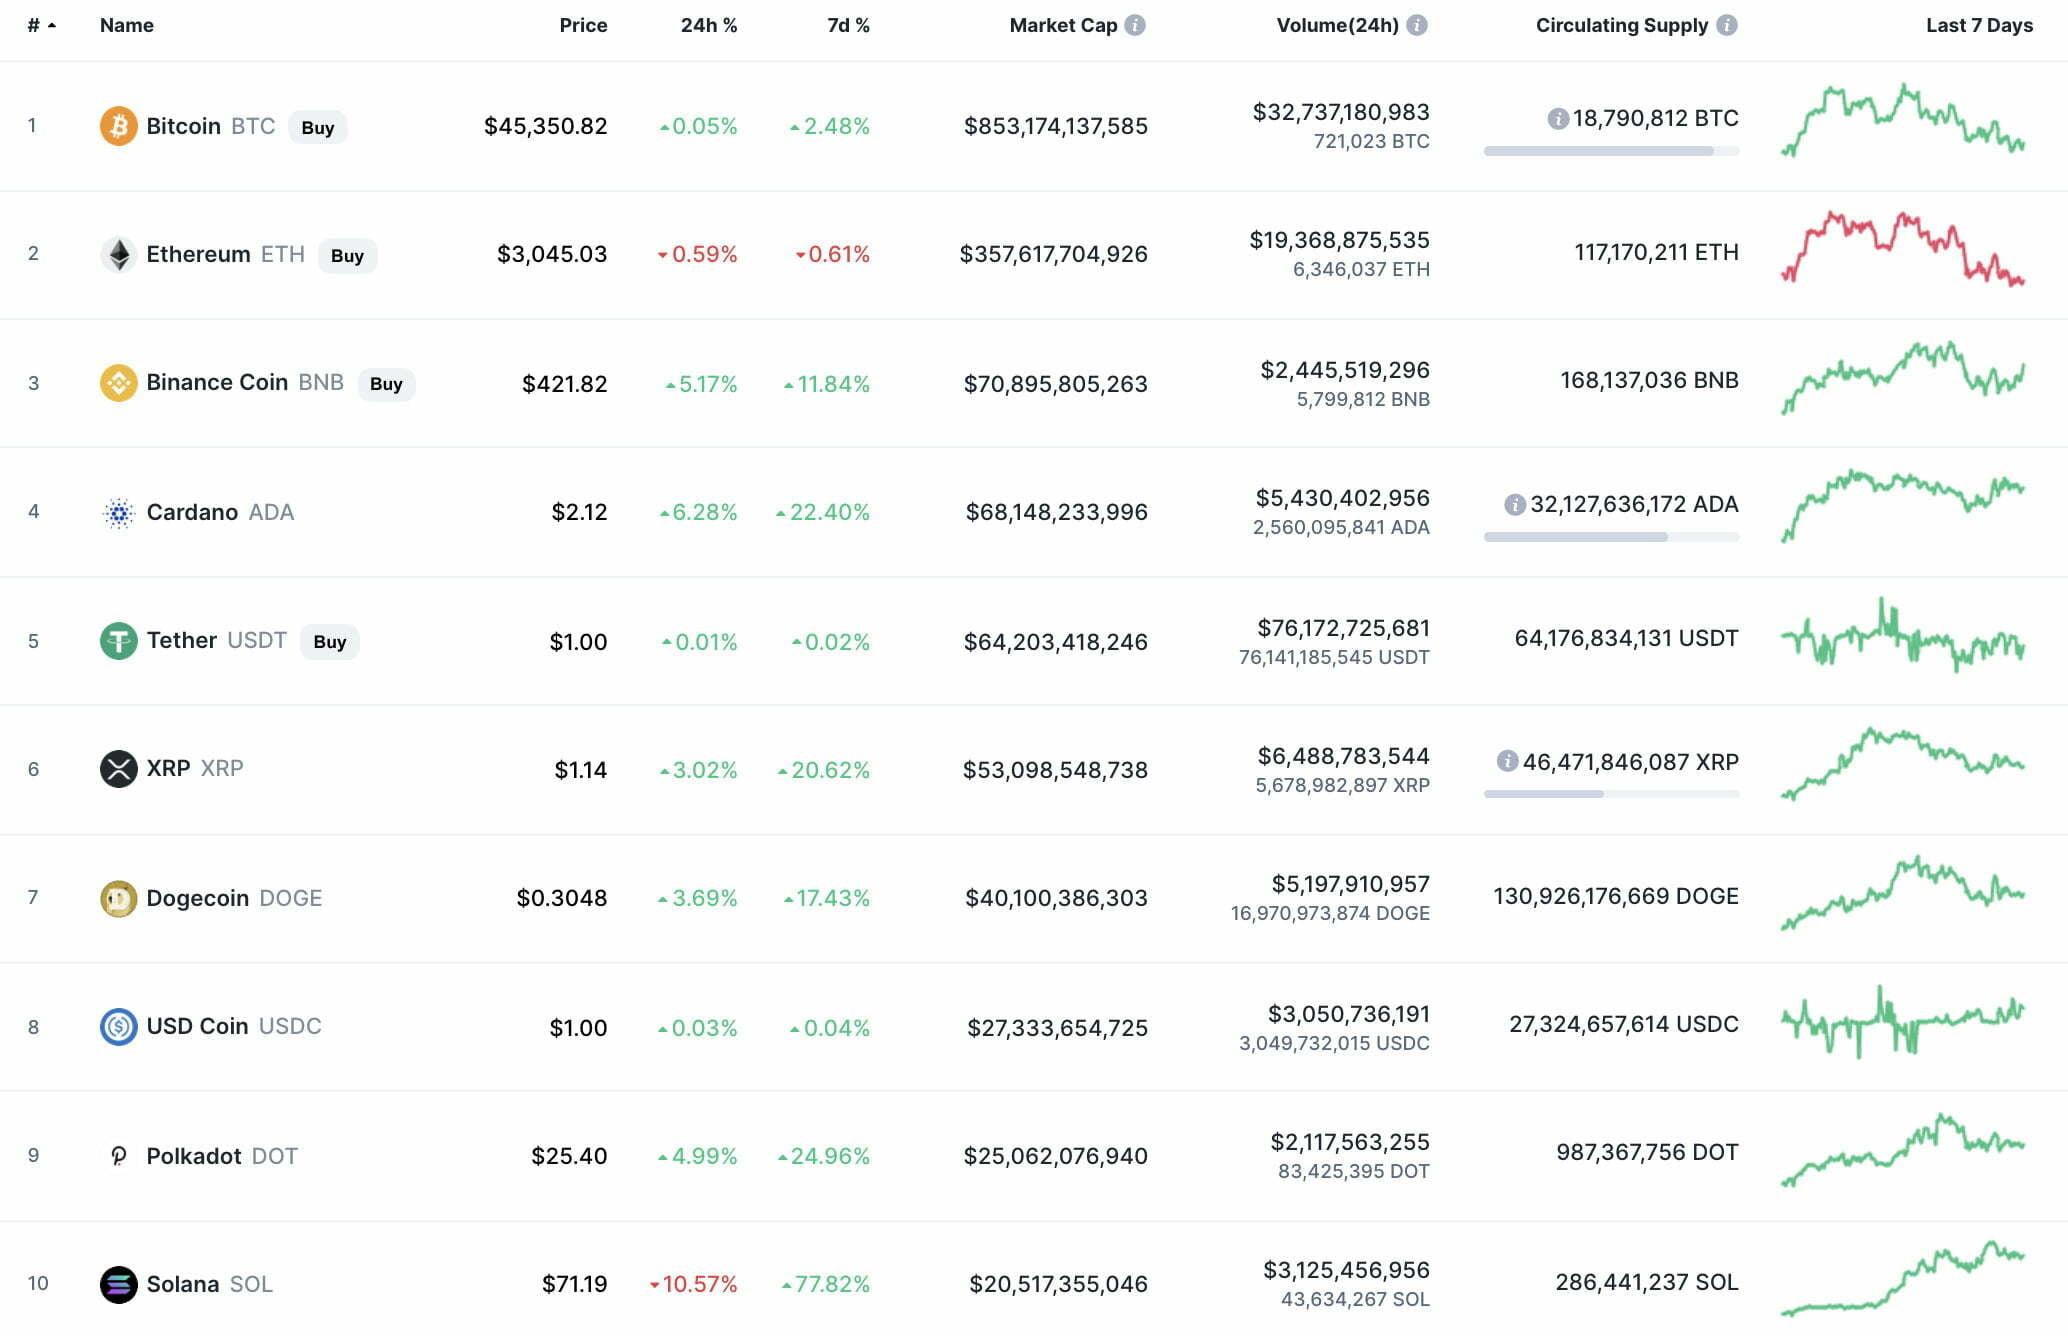 19 Ağustos Kripto Para Fiyat Analizi: BTC, ETH ve XRP 1 - 19 agustos kripto para fiyat analizi btc eth ve xrp 1